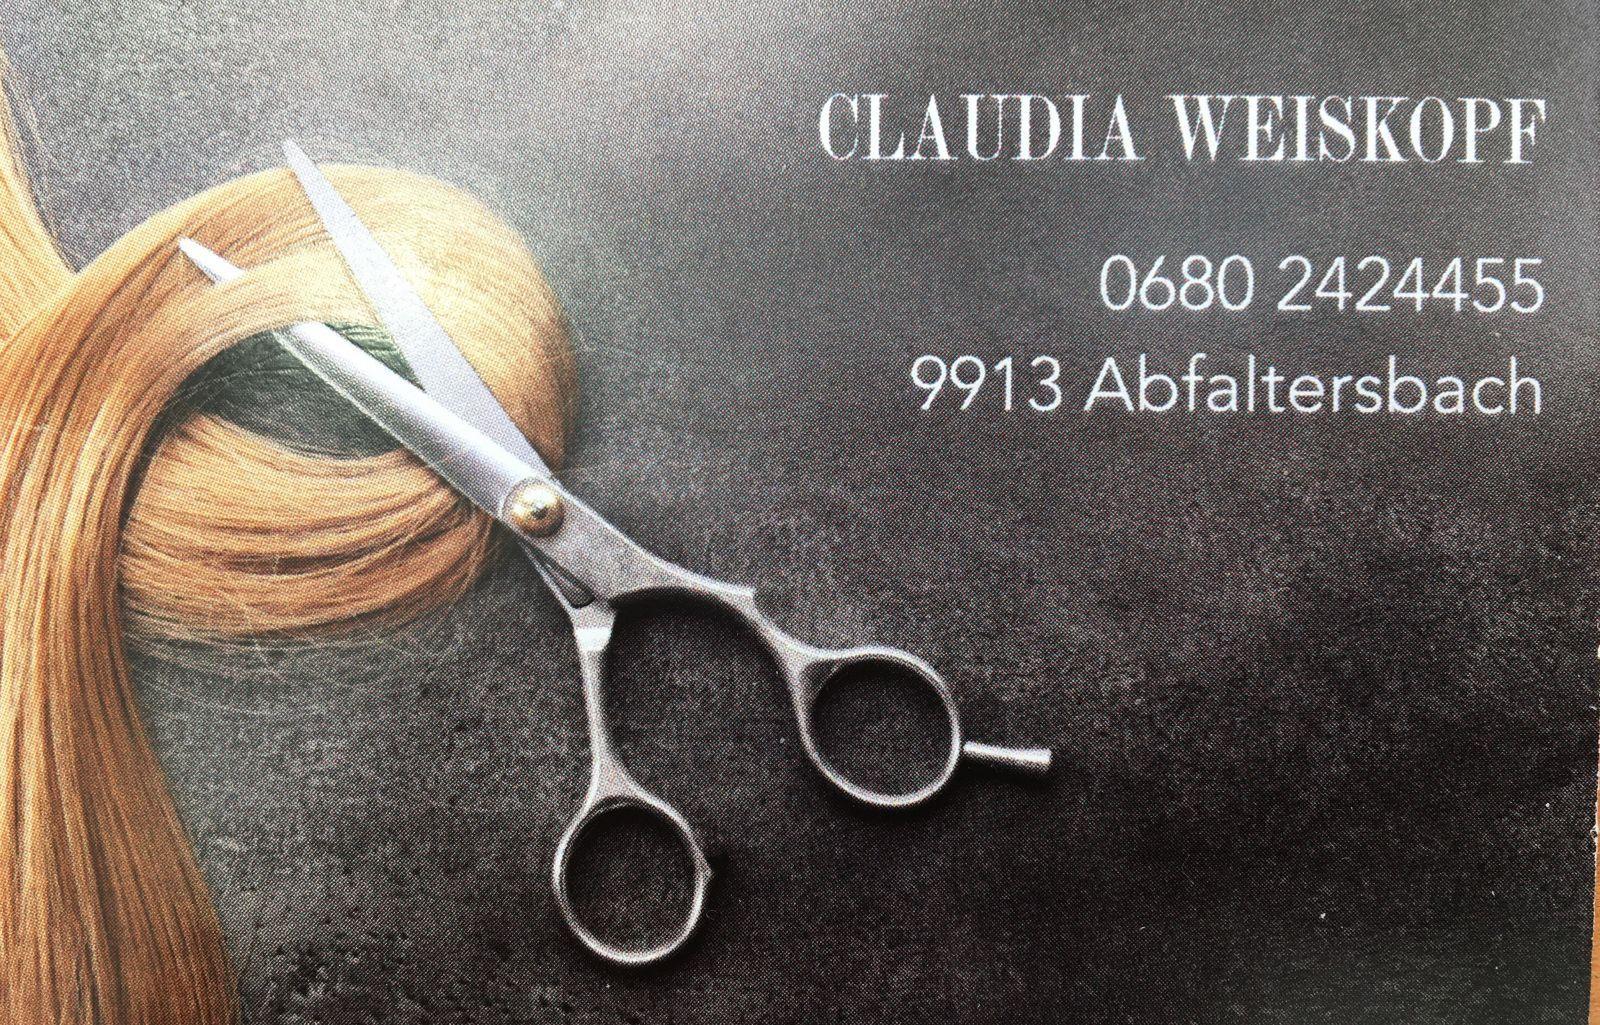 Visitenkarte Claudia Weißkopf